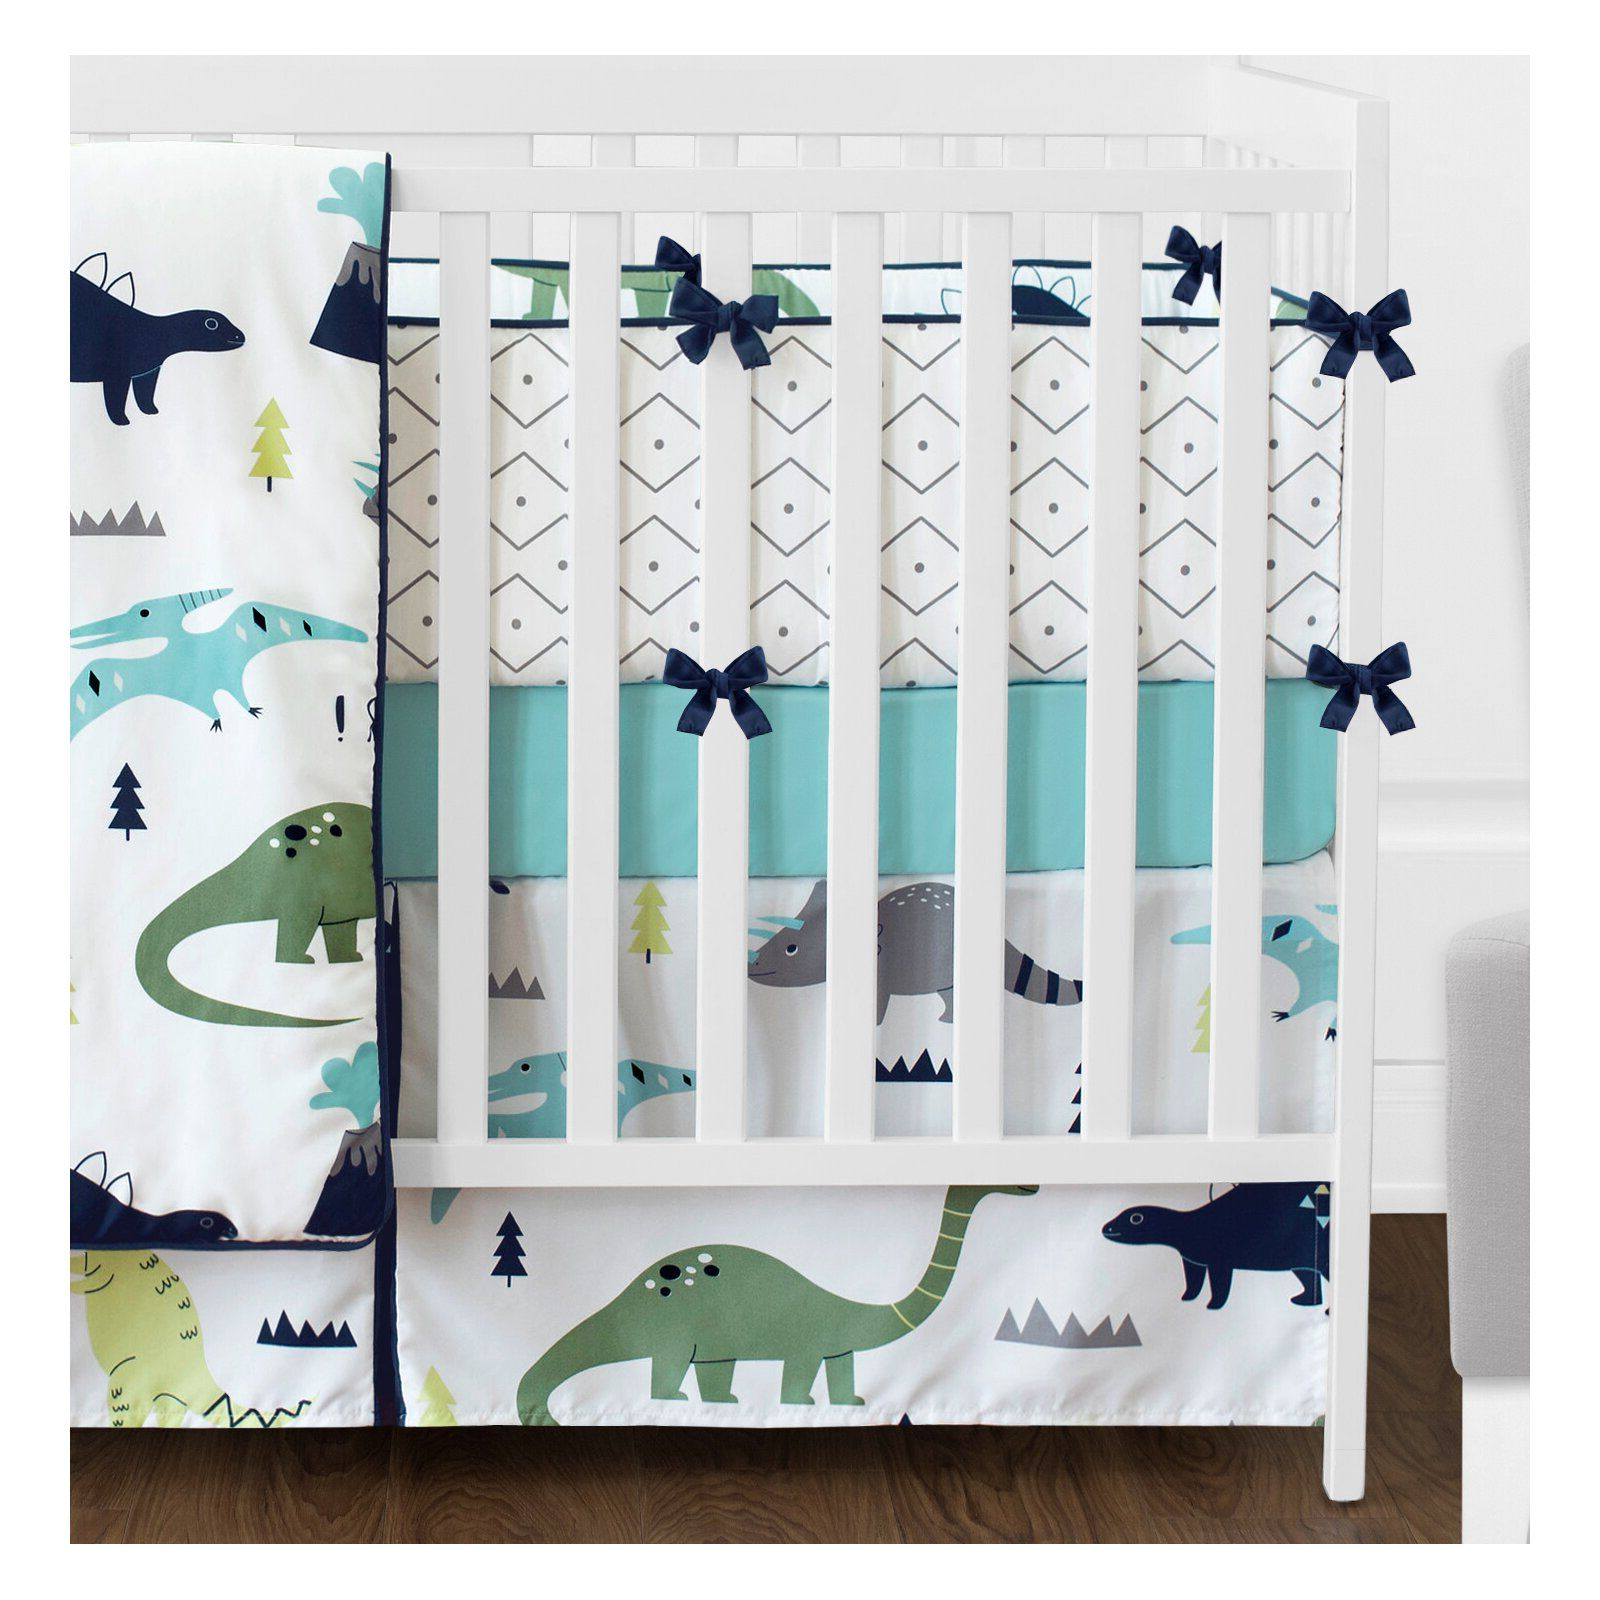 Sweet Jojo Designs Mod Dinosaur 9 Piece Crib Bedding Set Regarding Preferred Blended Fabric Mod Dinosaur 3 Piece Wall Hangings Set (View 6 of 20)